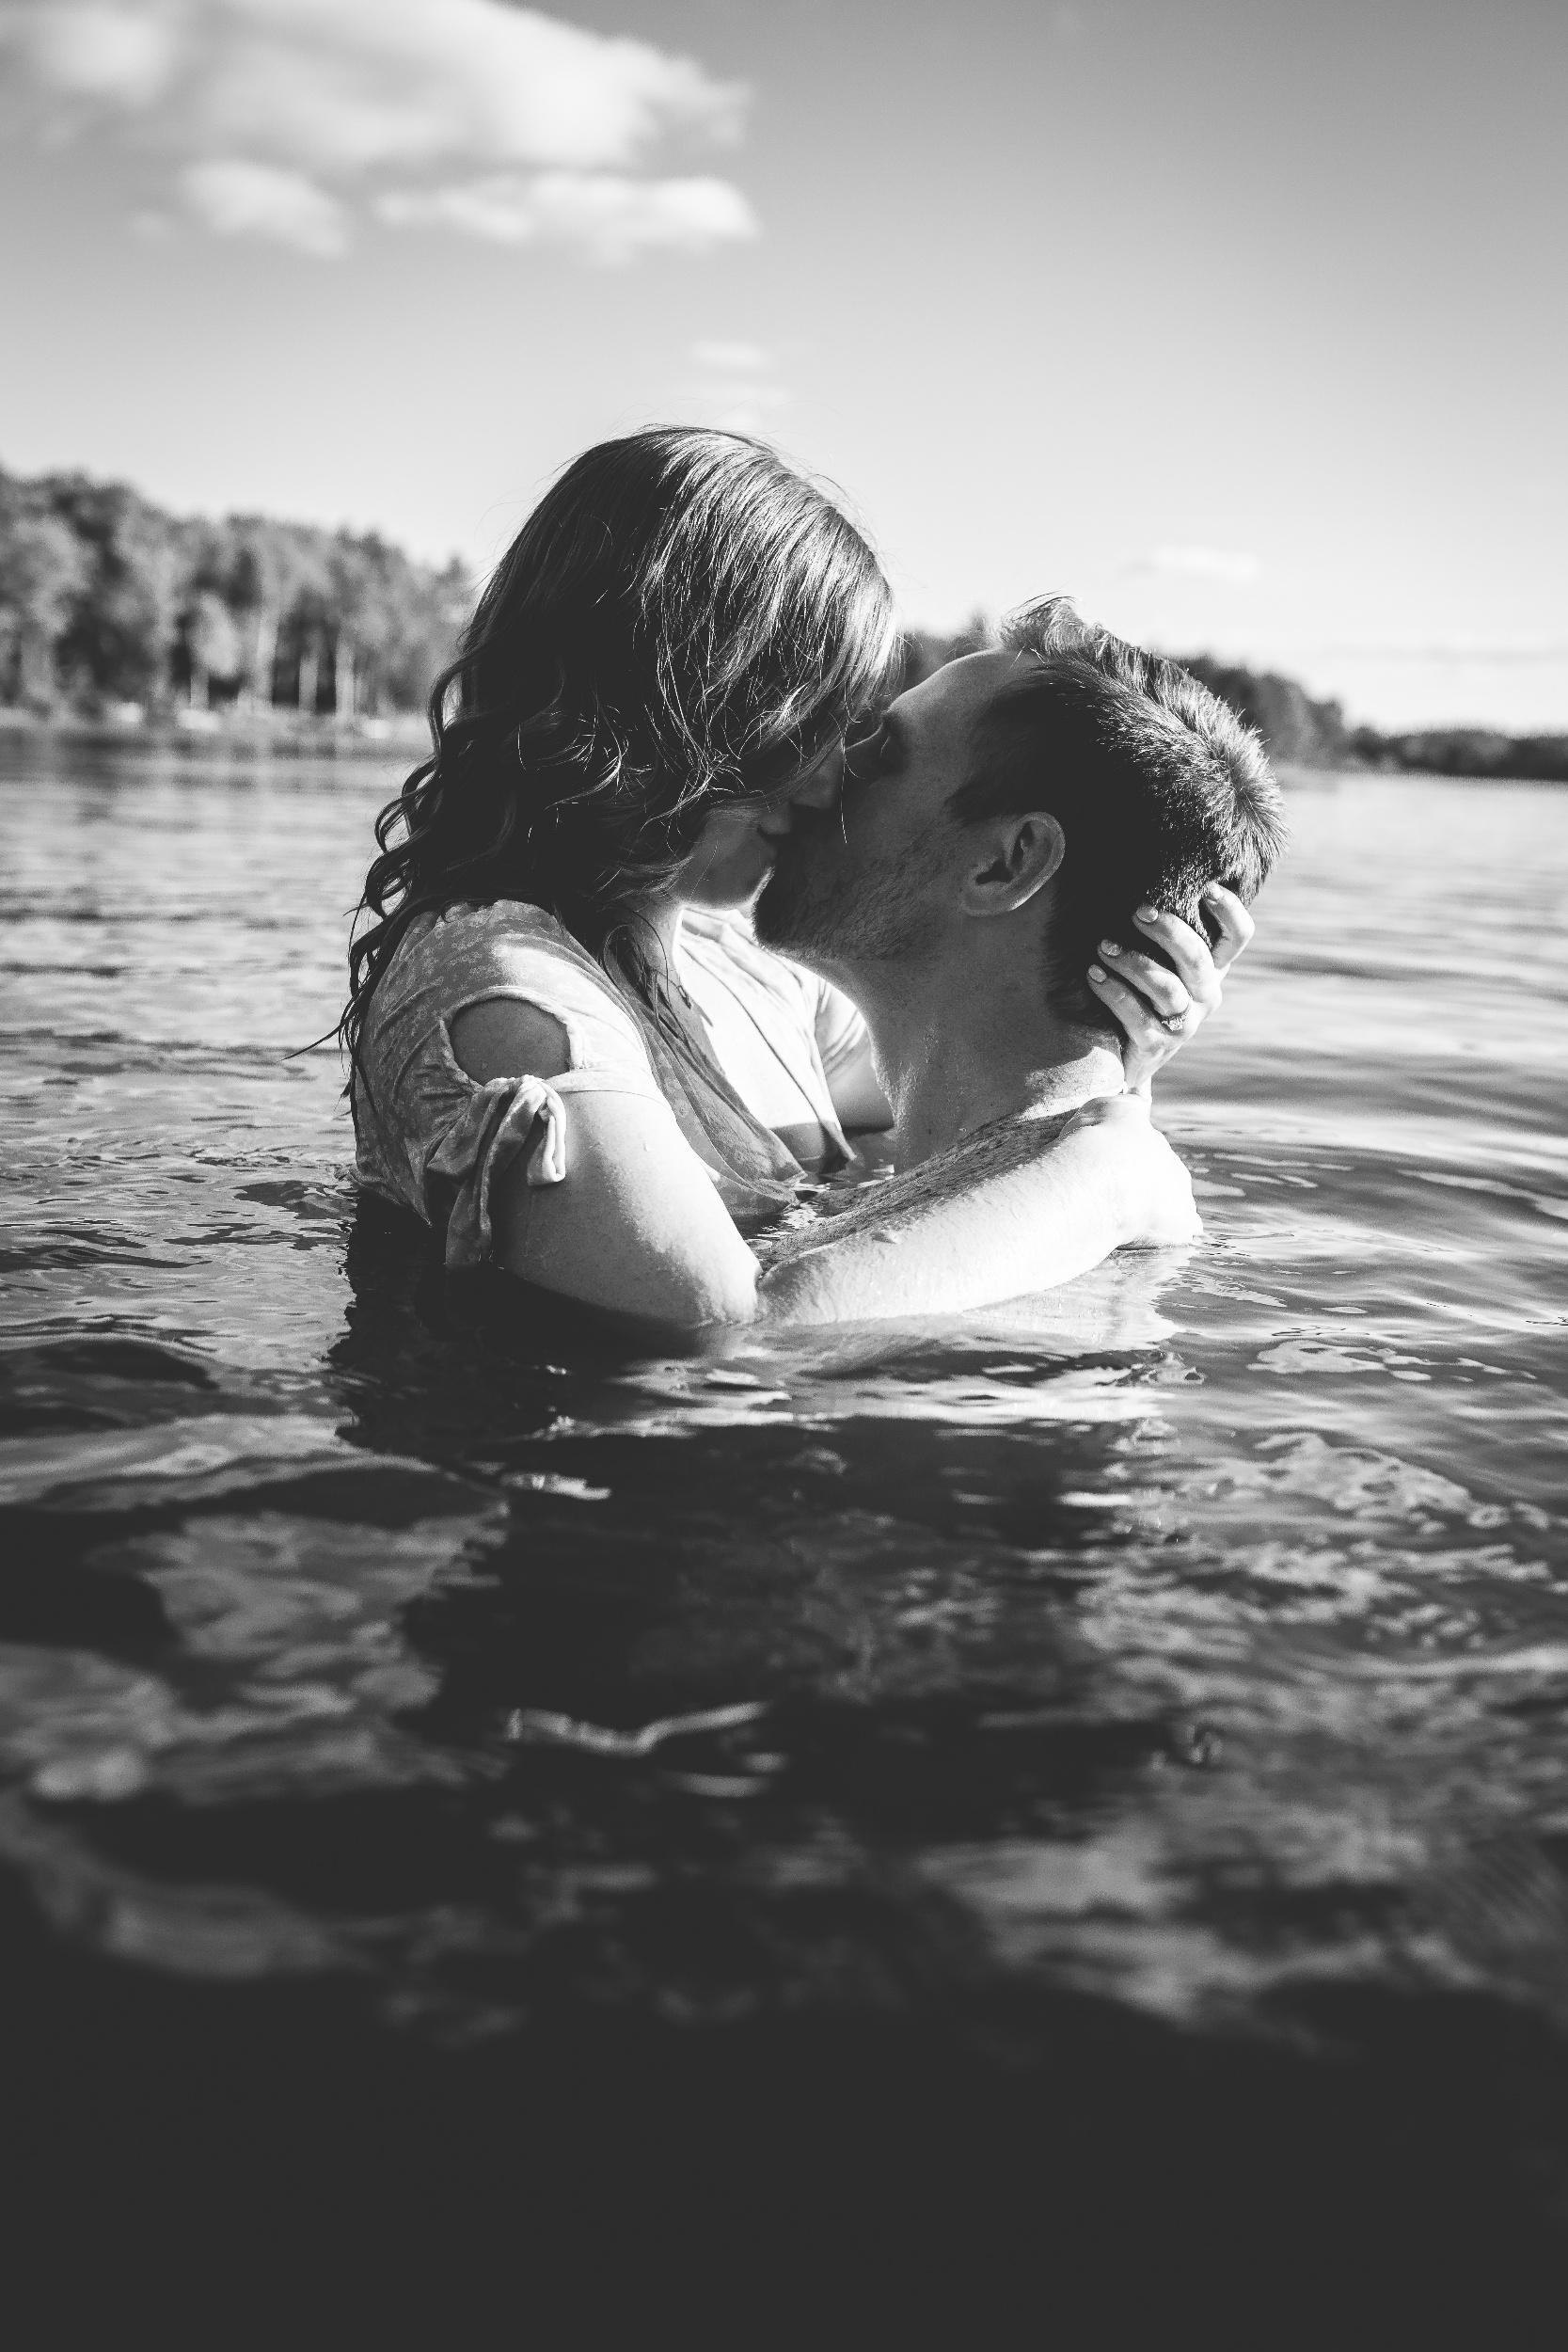 processed_Amy D Photography- Barrie Wedding Photographer-Cottage Engagement- Engagement Pose- Muskoka Wedding Photographer-105.jpg